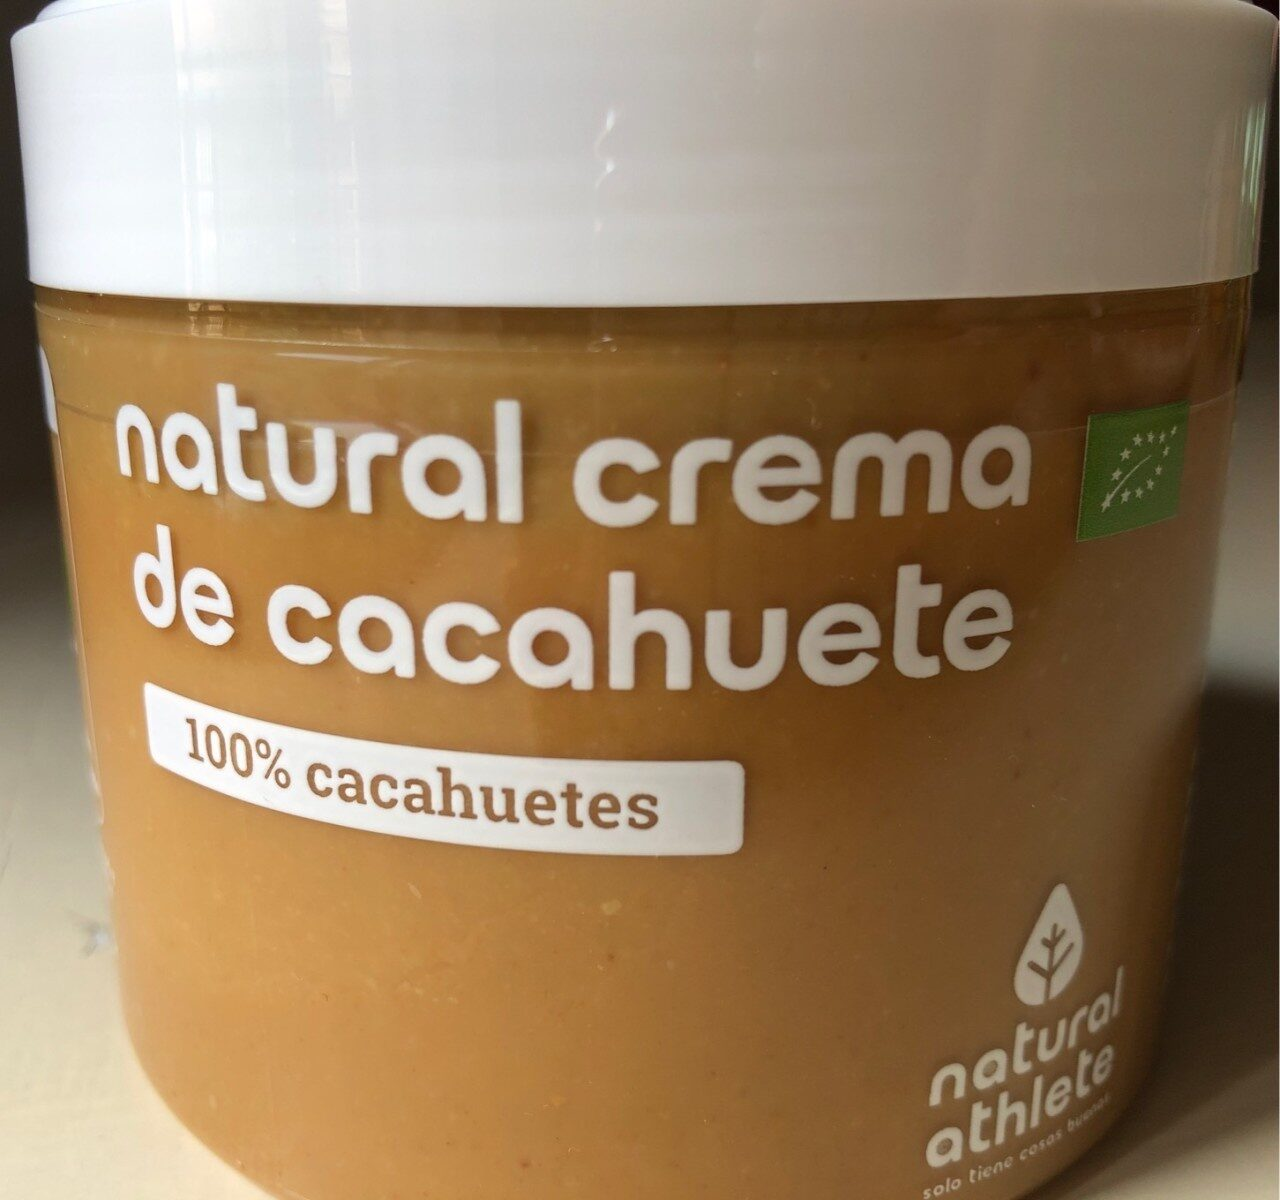 Natural Crema de Cacahuete - Producto